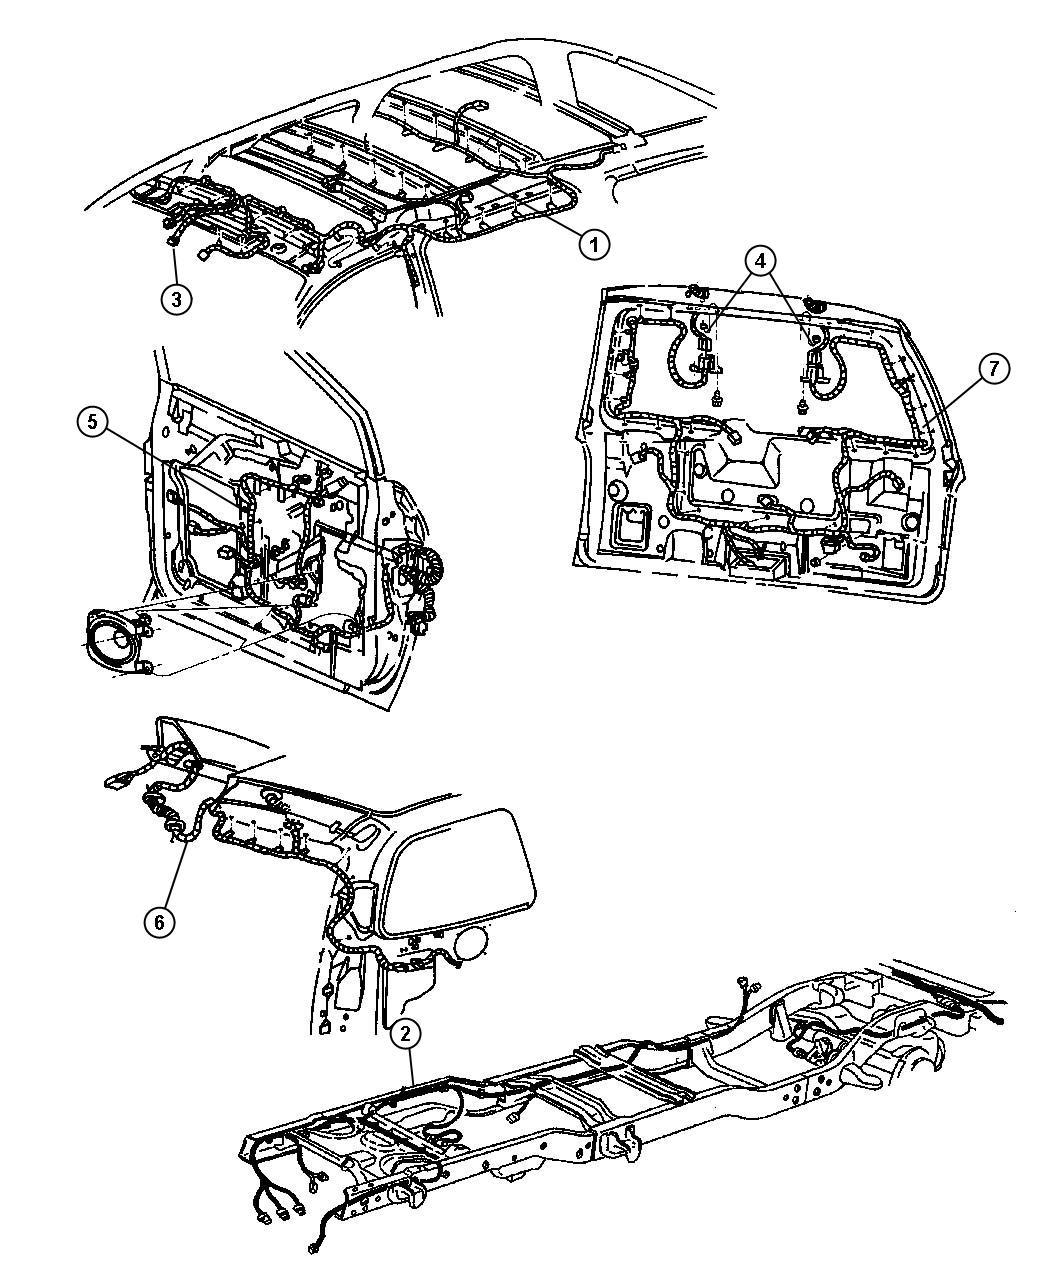 Dodge Ram Connector 7 Way Ahc Pollak Sseries